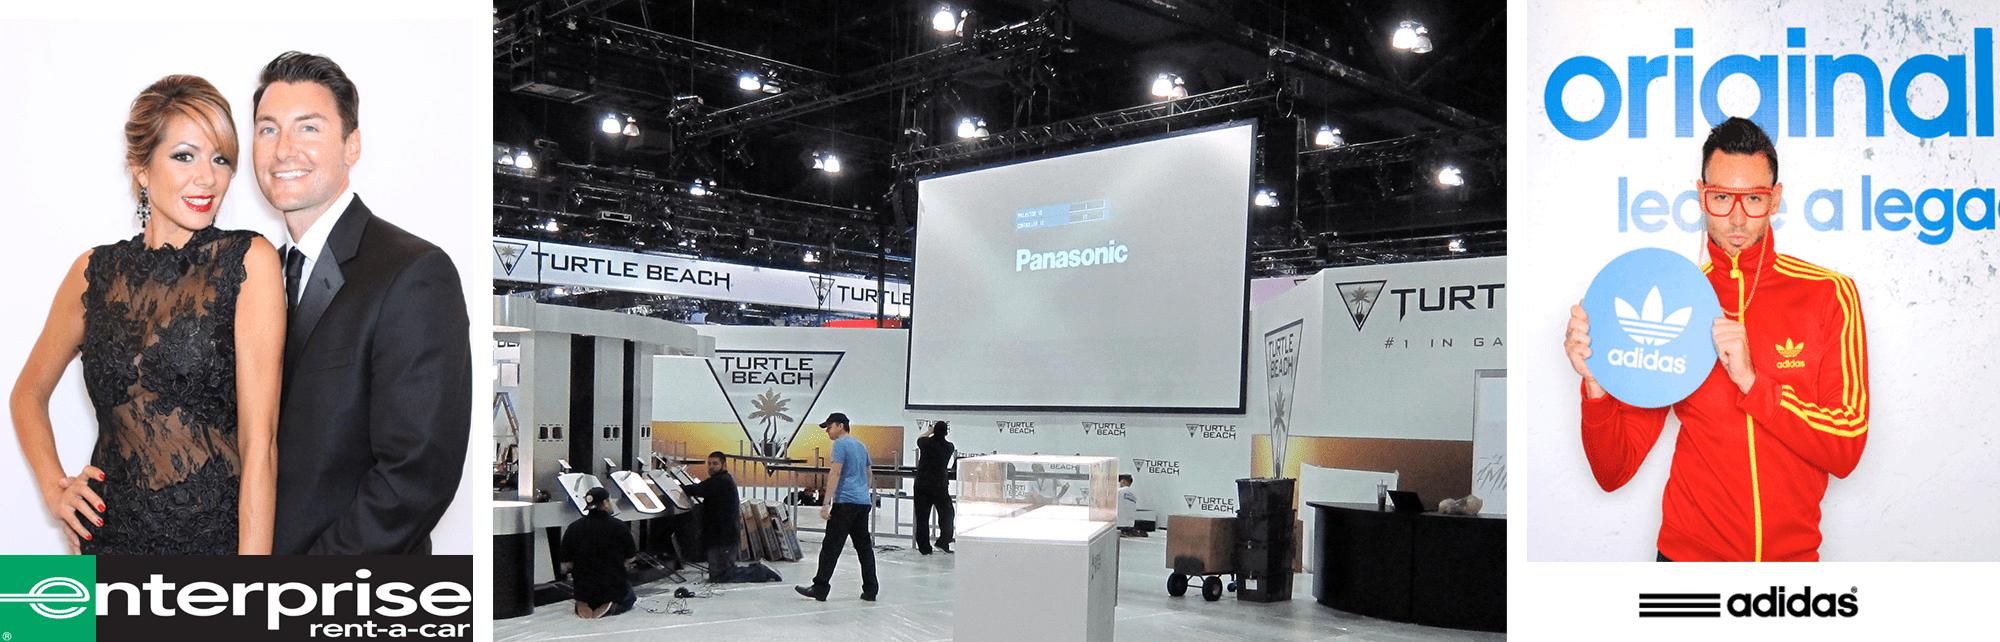 empresa fotomaton photocall